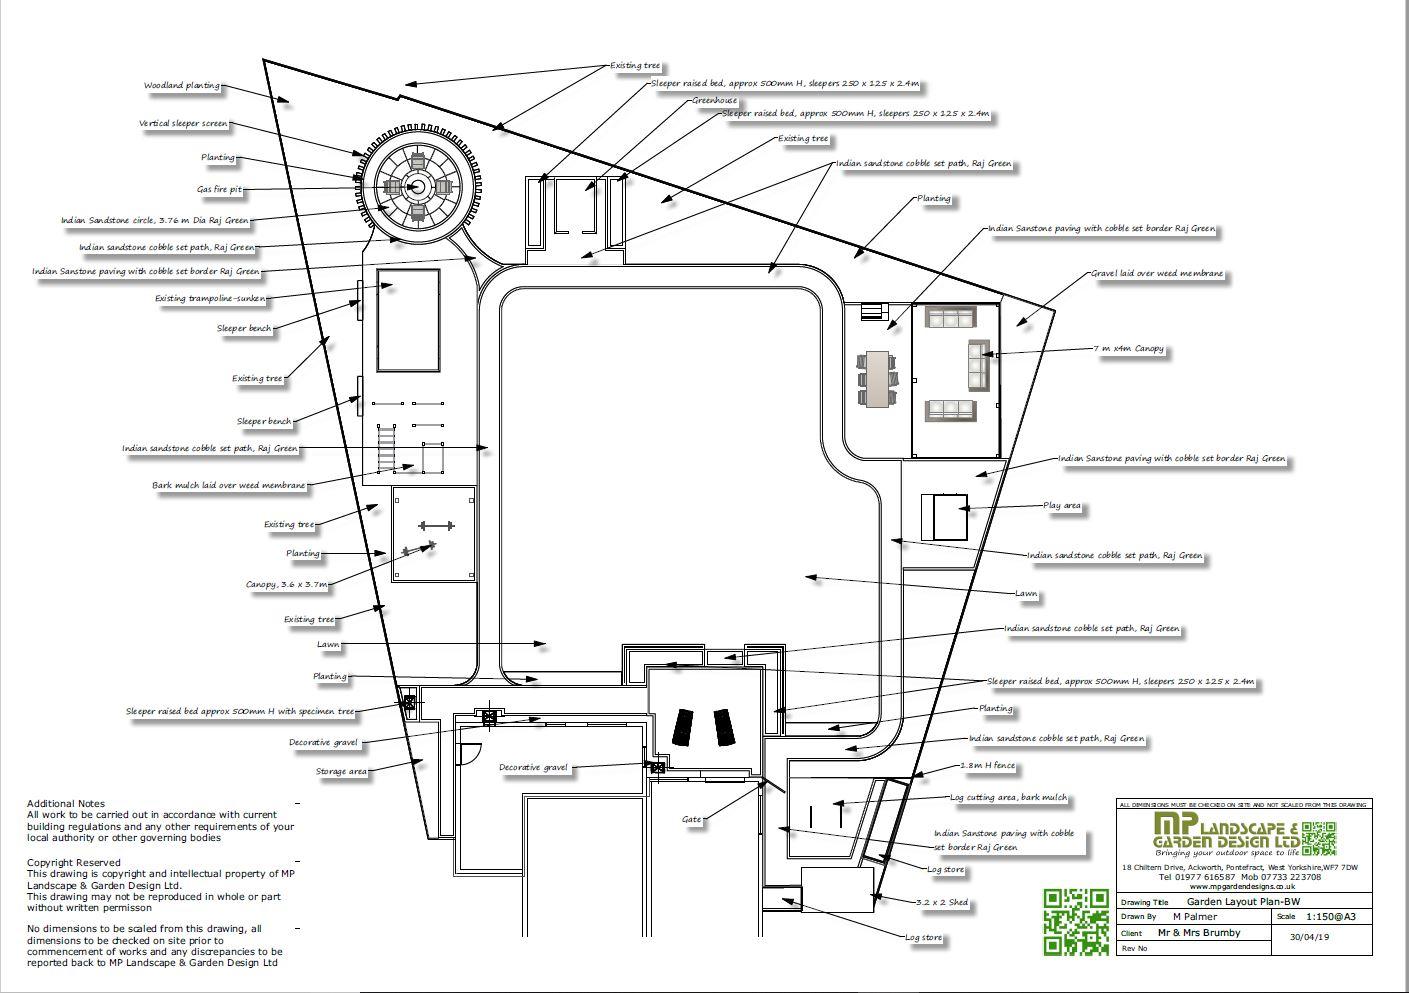 1,Garden layout plans-black and white for a rear garden in Darrington